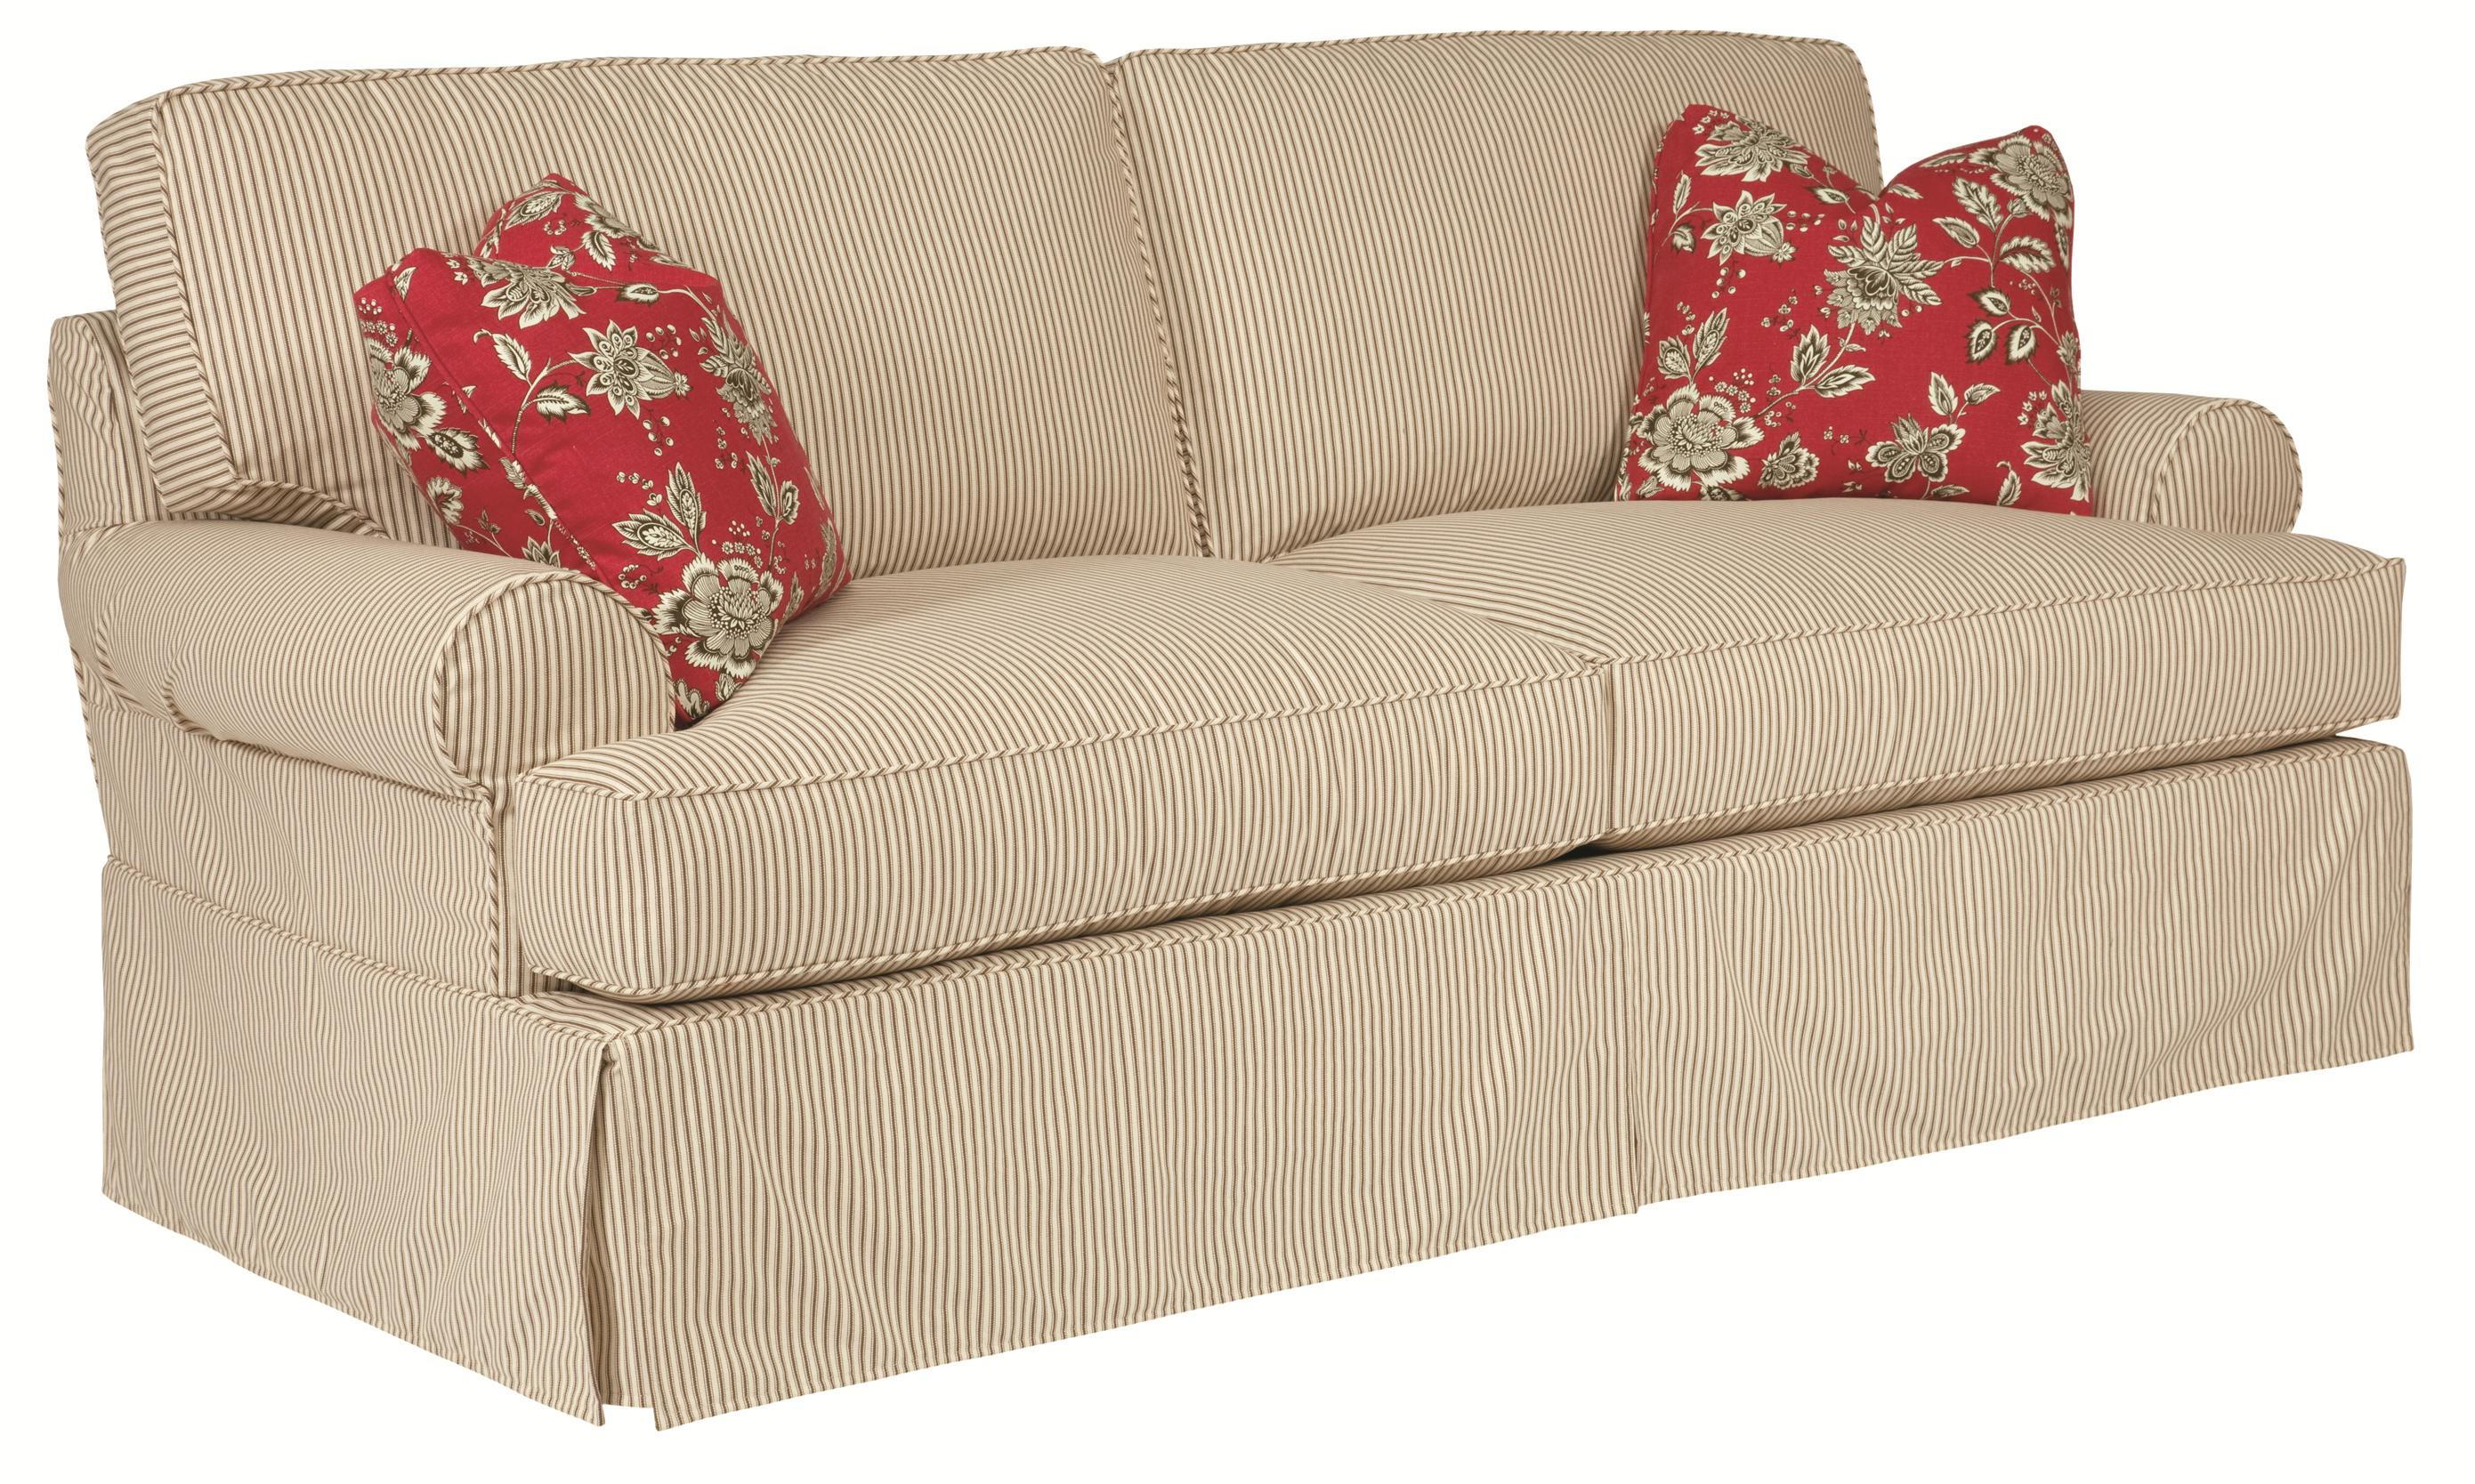 Samantha Three Seat Sofa with Slipcover Tailoring & Loose Pillow